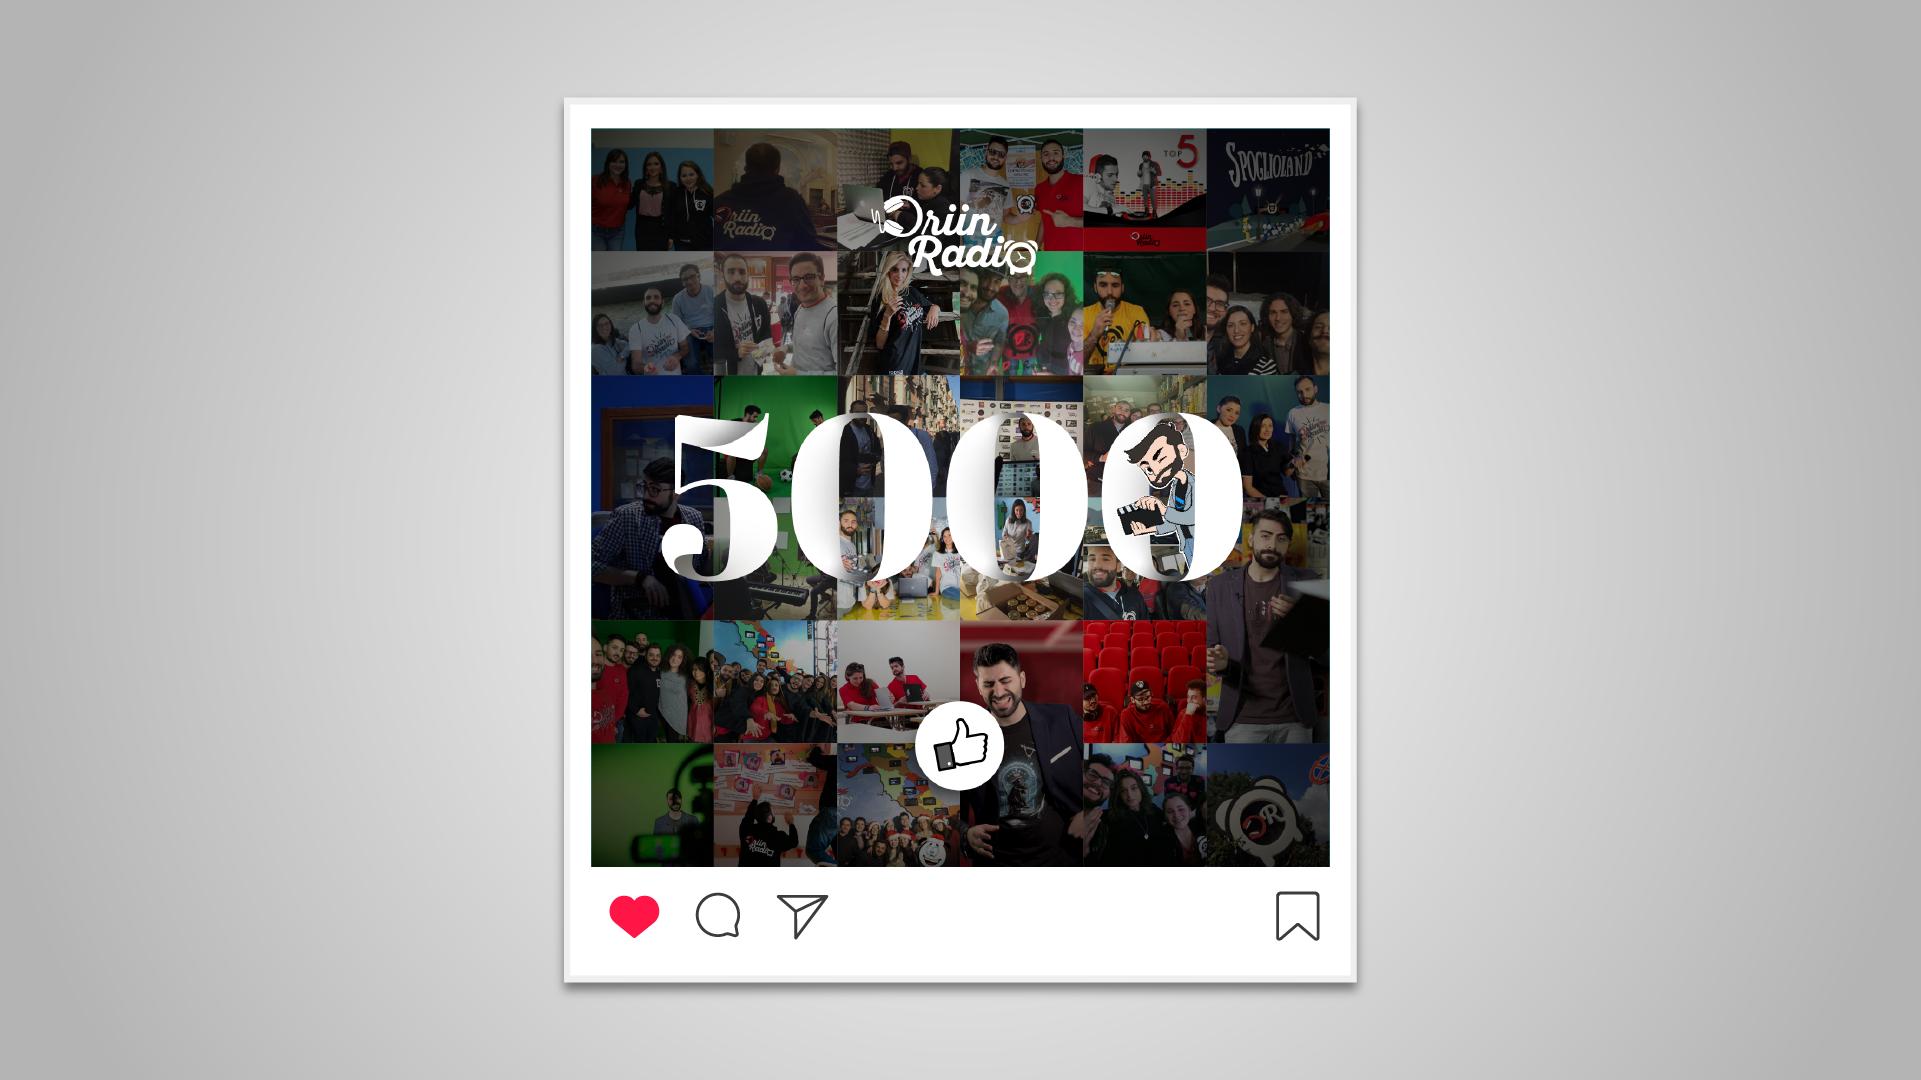 driin radio post 5000